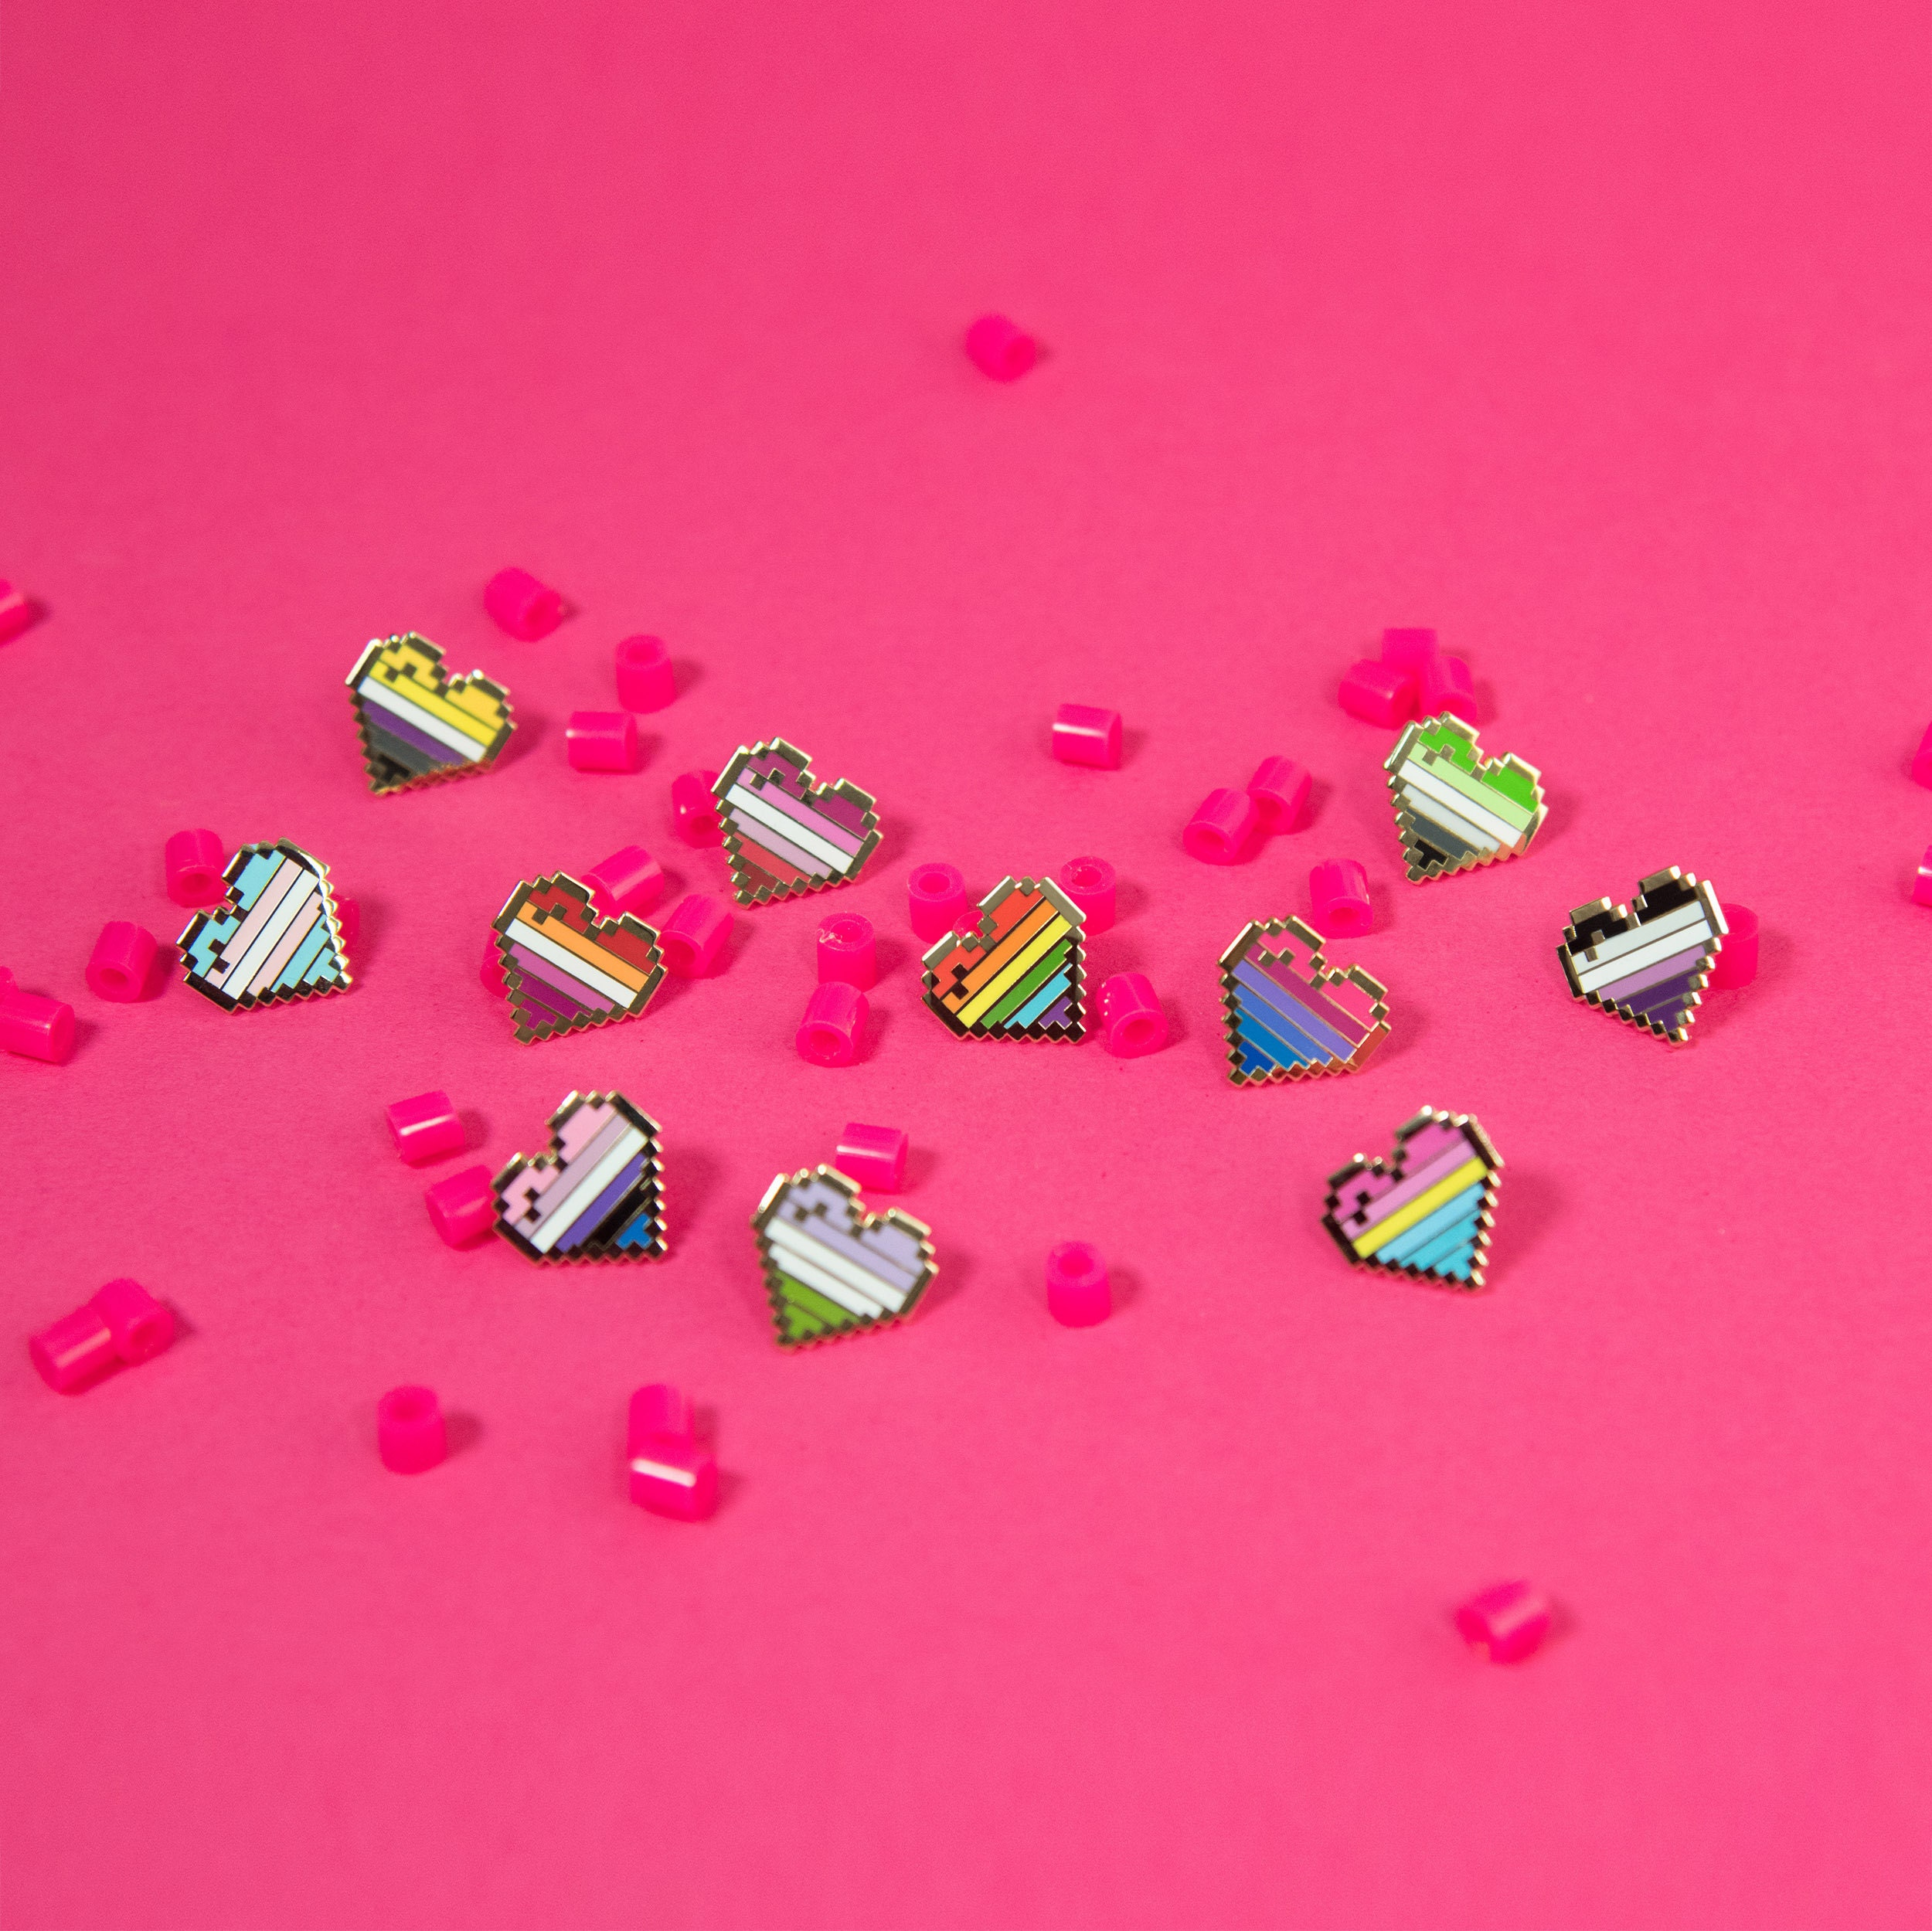 Rainbow Pixel Heart Pins London UK Pride Accessories Gay Badge